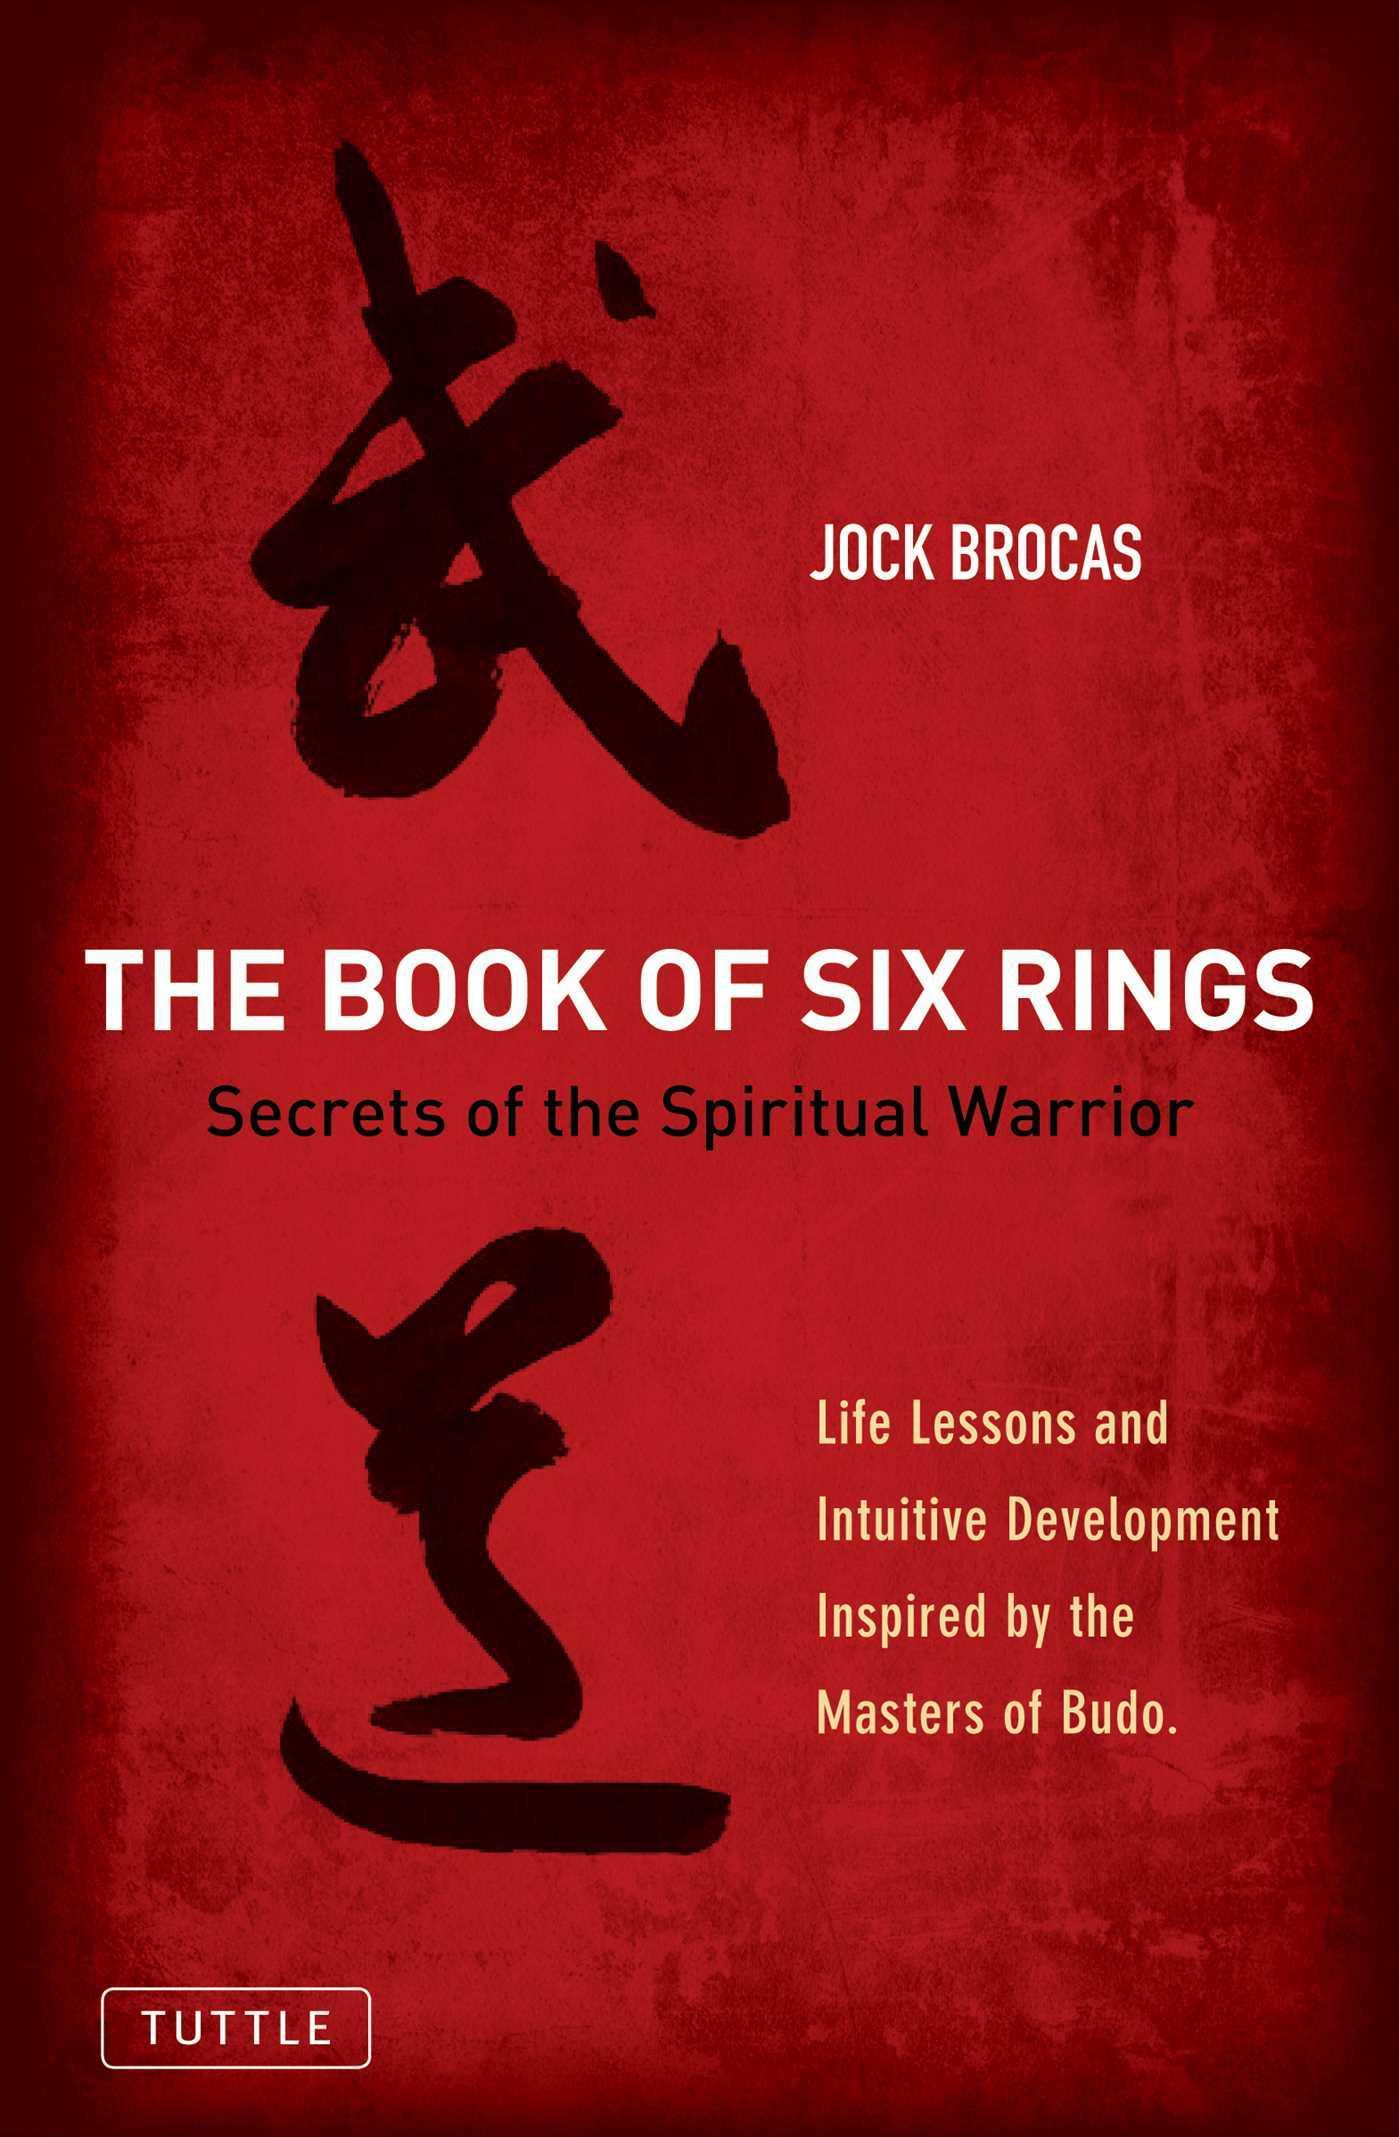 Book of Six Rings: Secrets of the Spiritual Warrior Jock Brocas